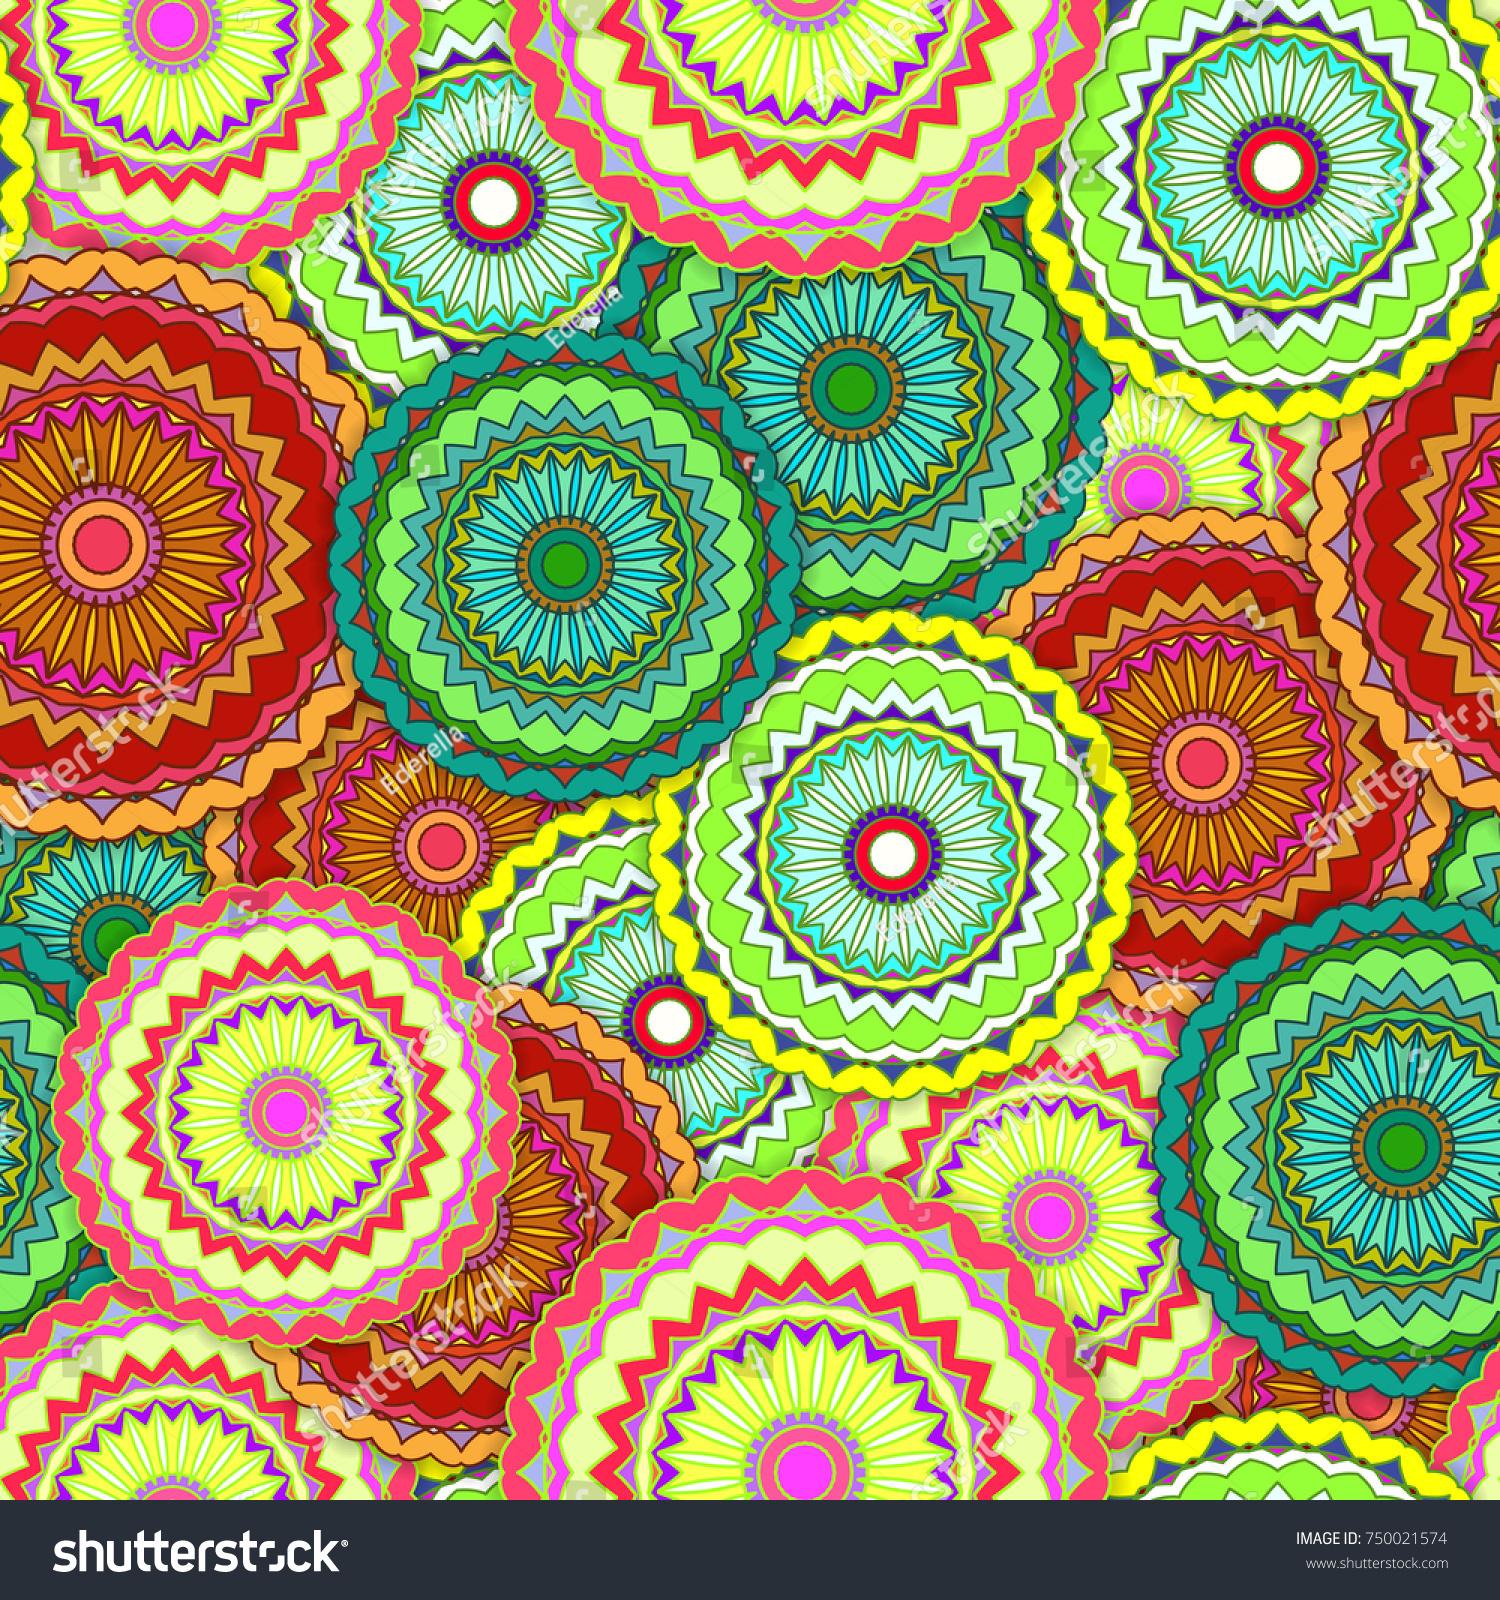 Seamless pattern with random scattered mandala. Bright colorful background,  islamic, arabic, muslim, japanese, eastern, oriental design. - Illustration